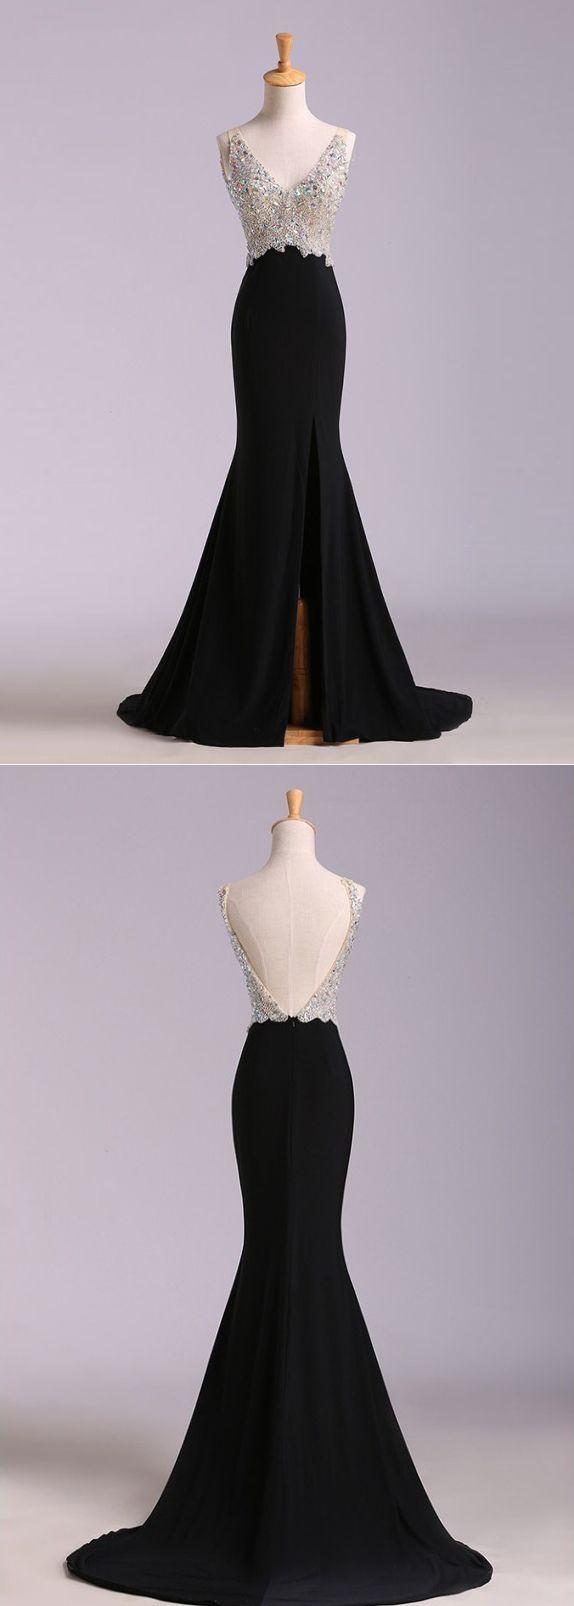 Black prom dresses vneck short train rhinestone sexy long prom